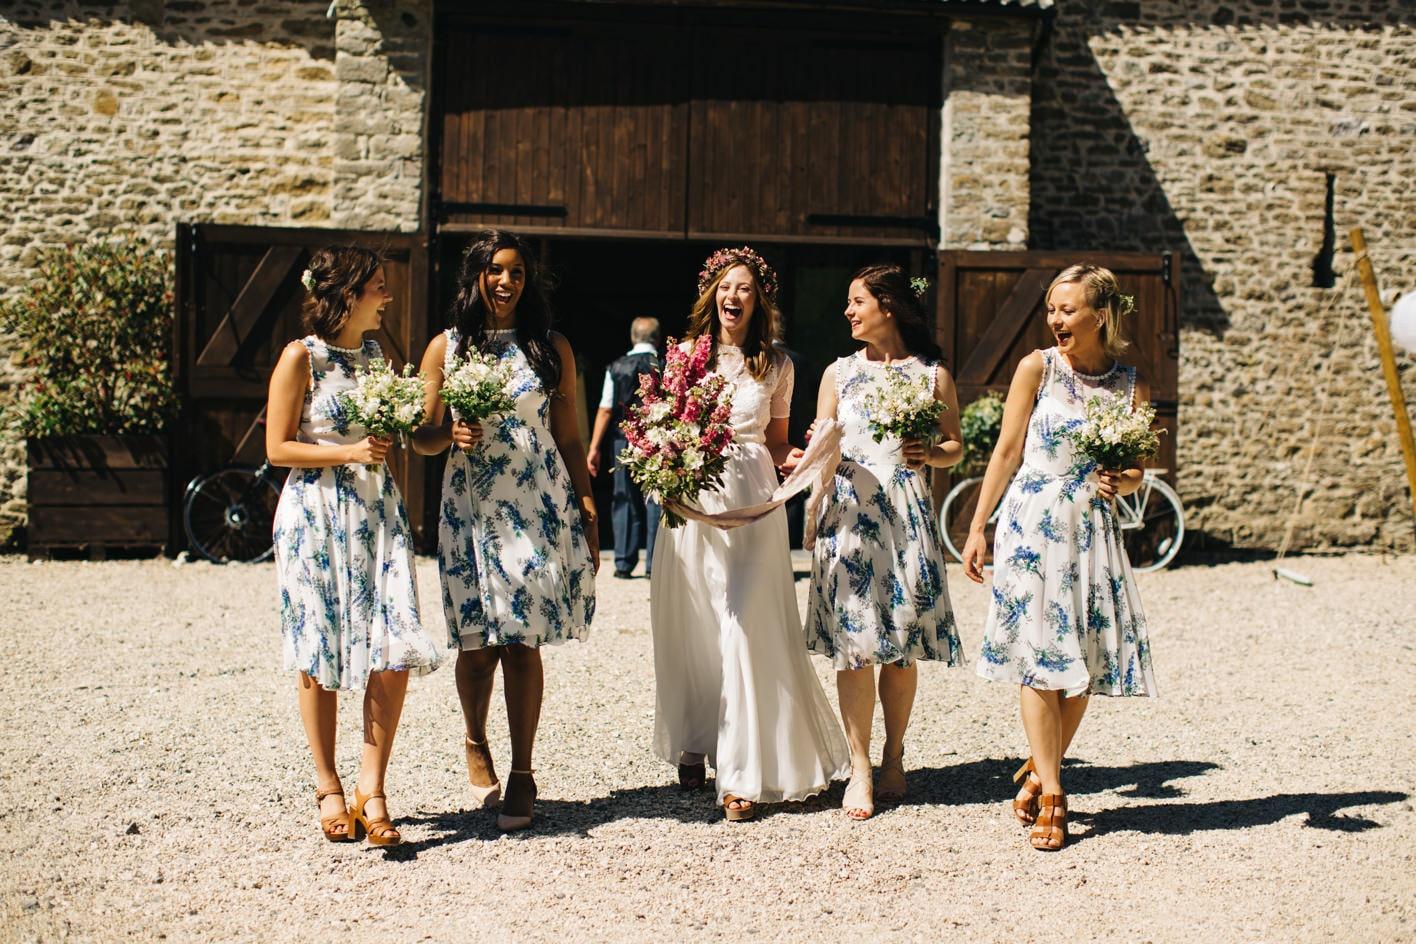 bride and bridesmaids lauging